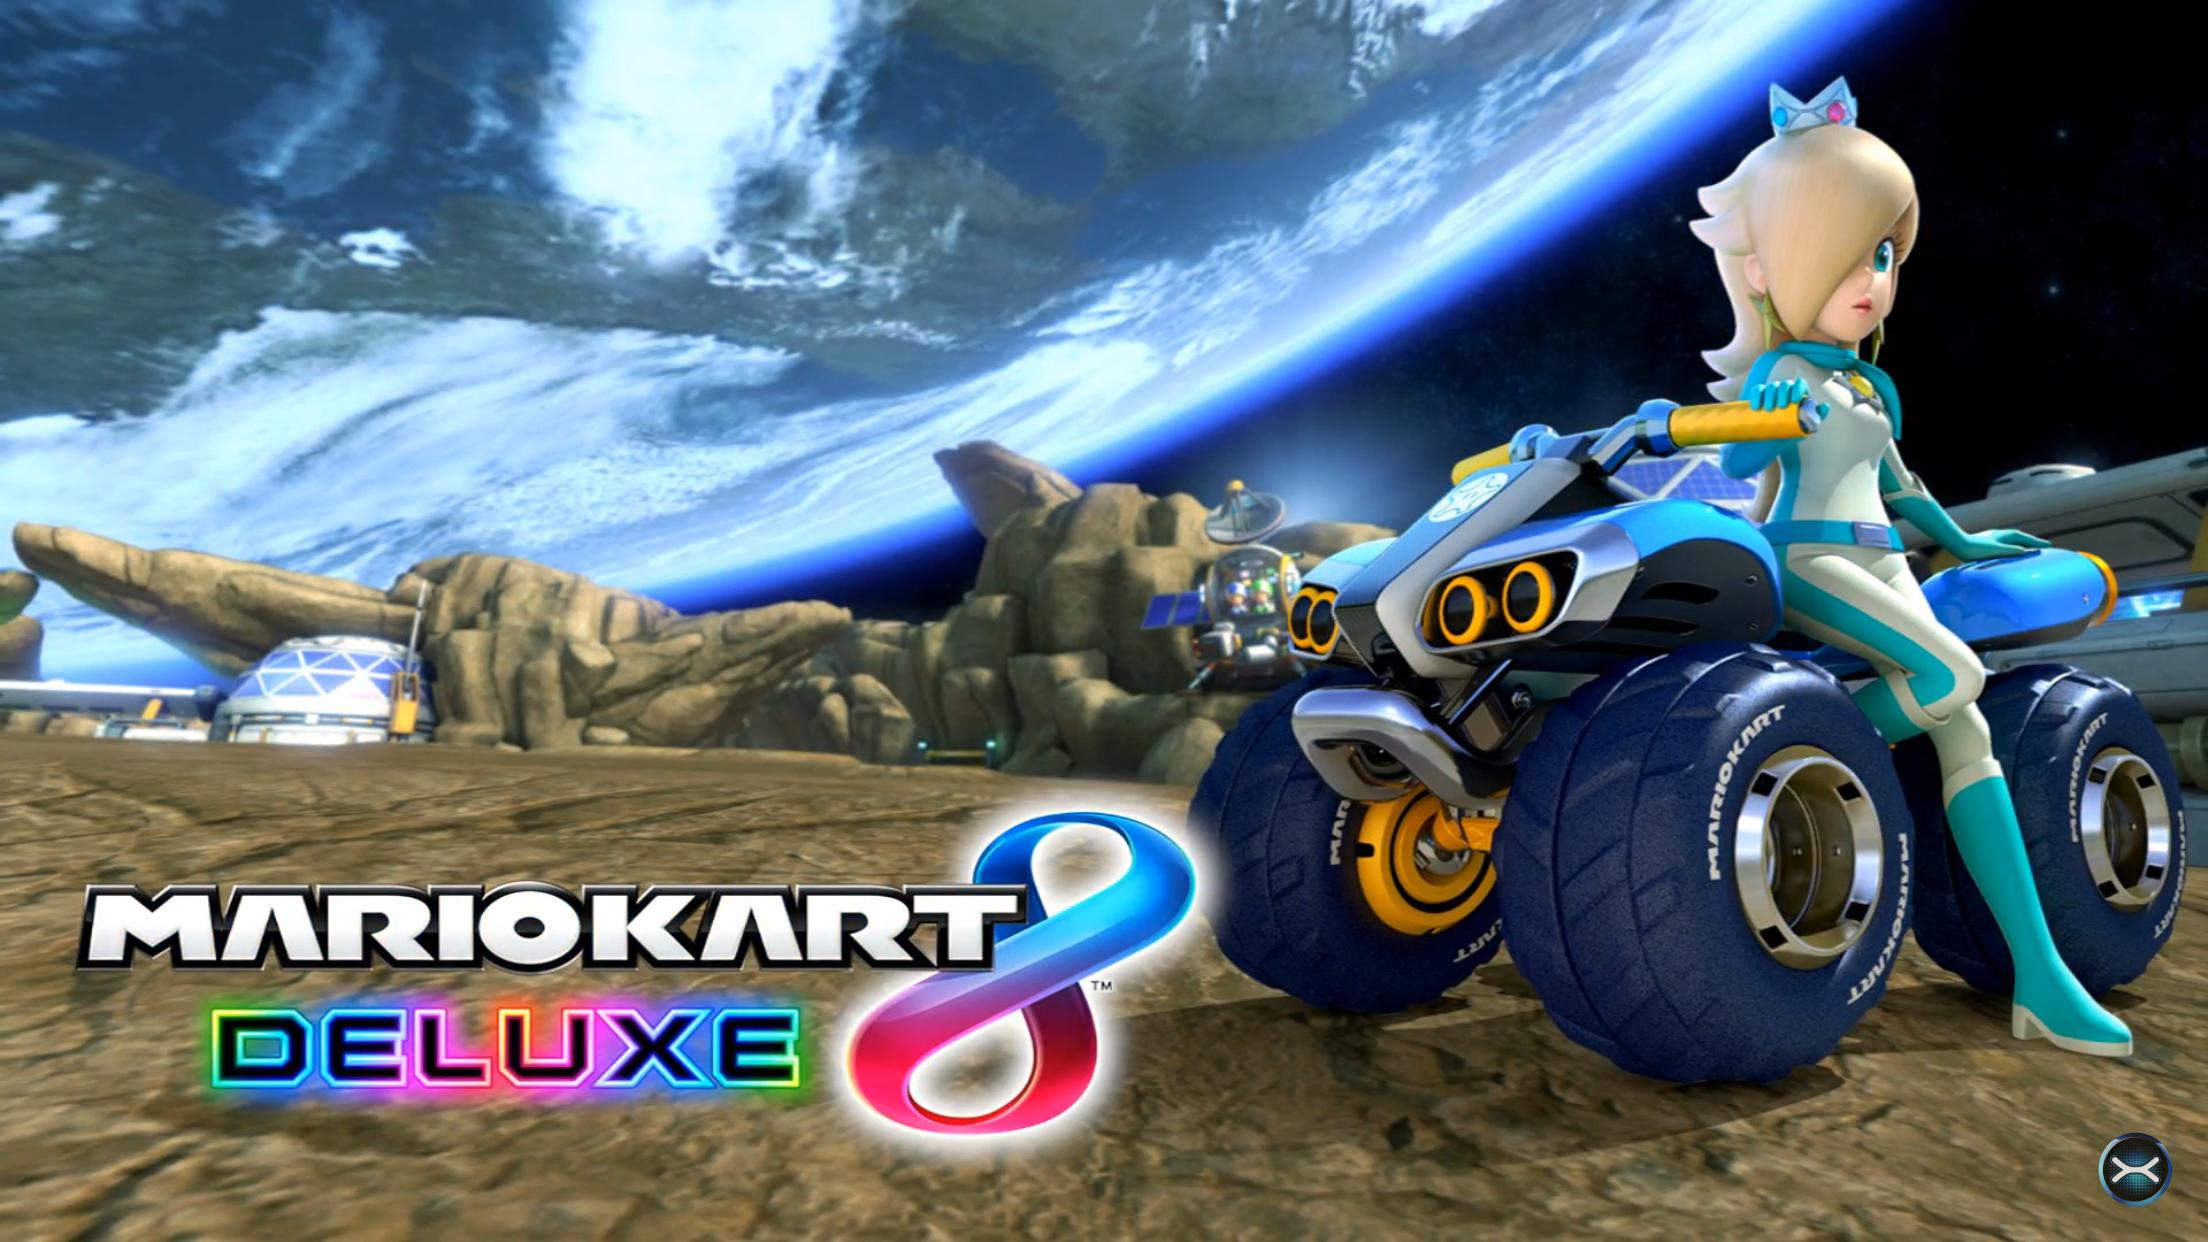 Donkey kong mario kart wii car tuning - Mario Kart 8 Deluxe Title Screen